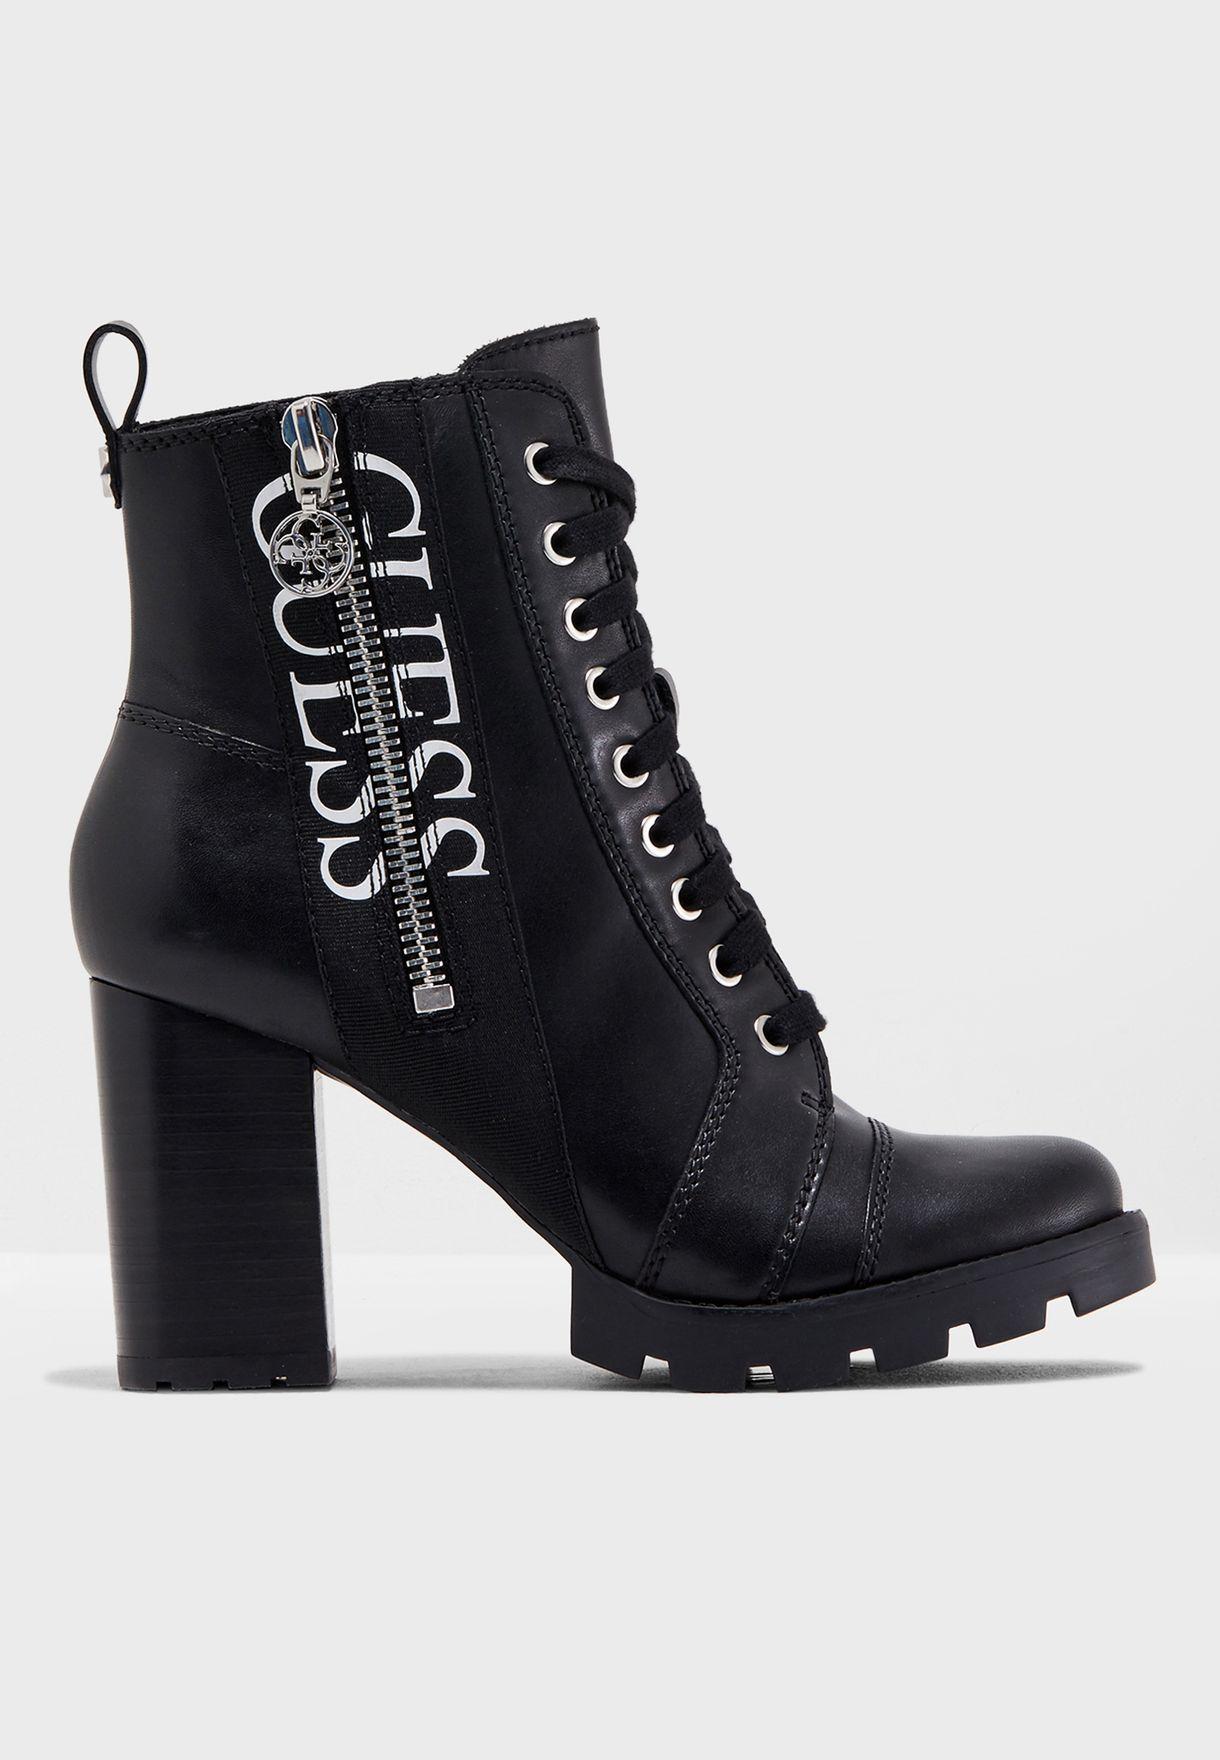 7f6e9aba2678 Shop Guess black Block Heel Boot gwREMEDY for Women in UAE ...